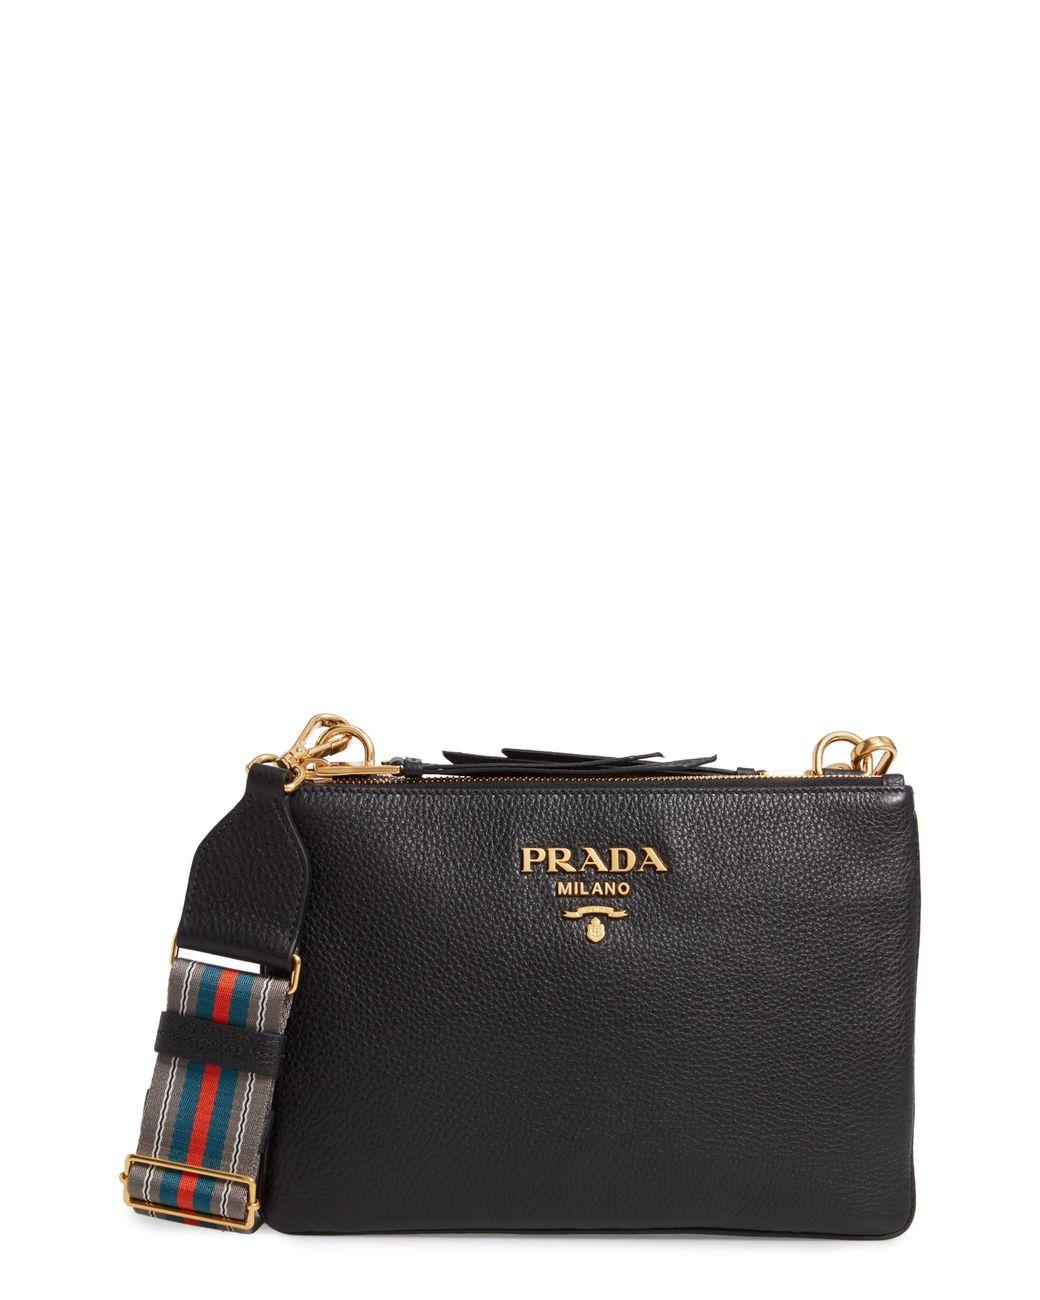 689eb74eb179 Lyst - Prada Vitello Daino Double Compartment Leather Crossbody Bag ...